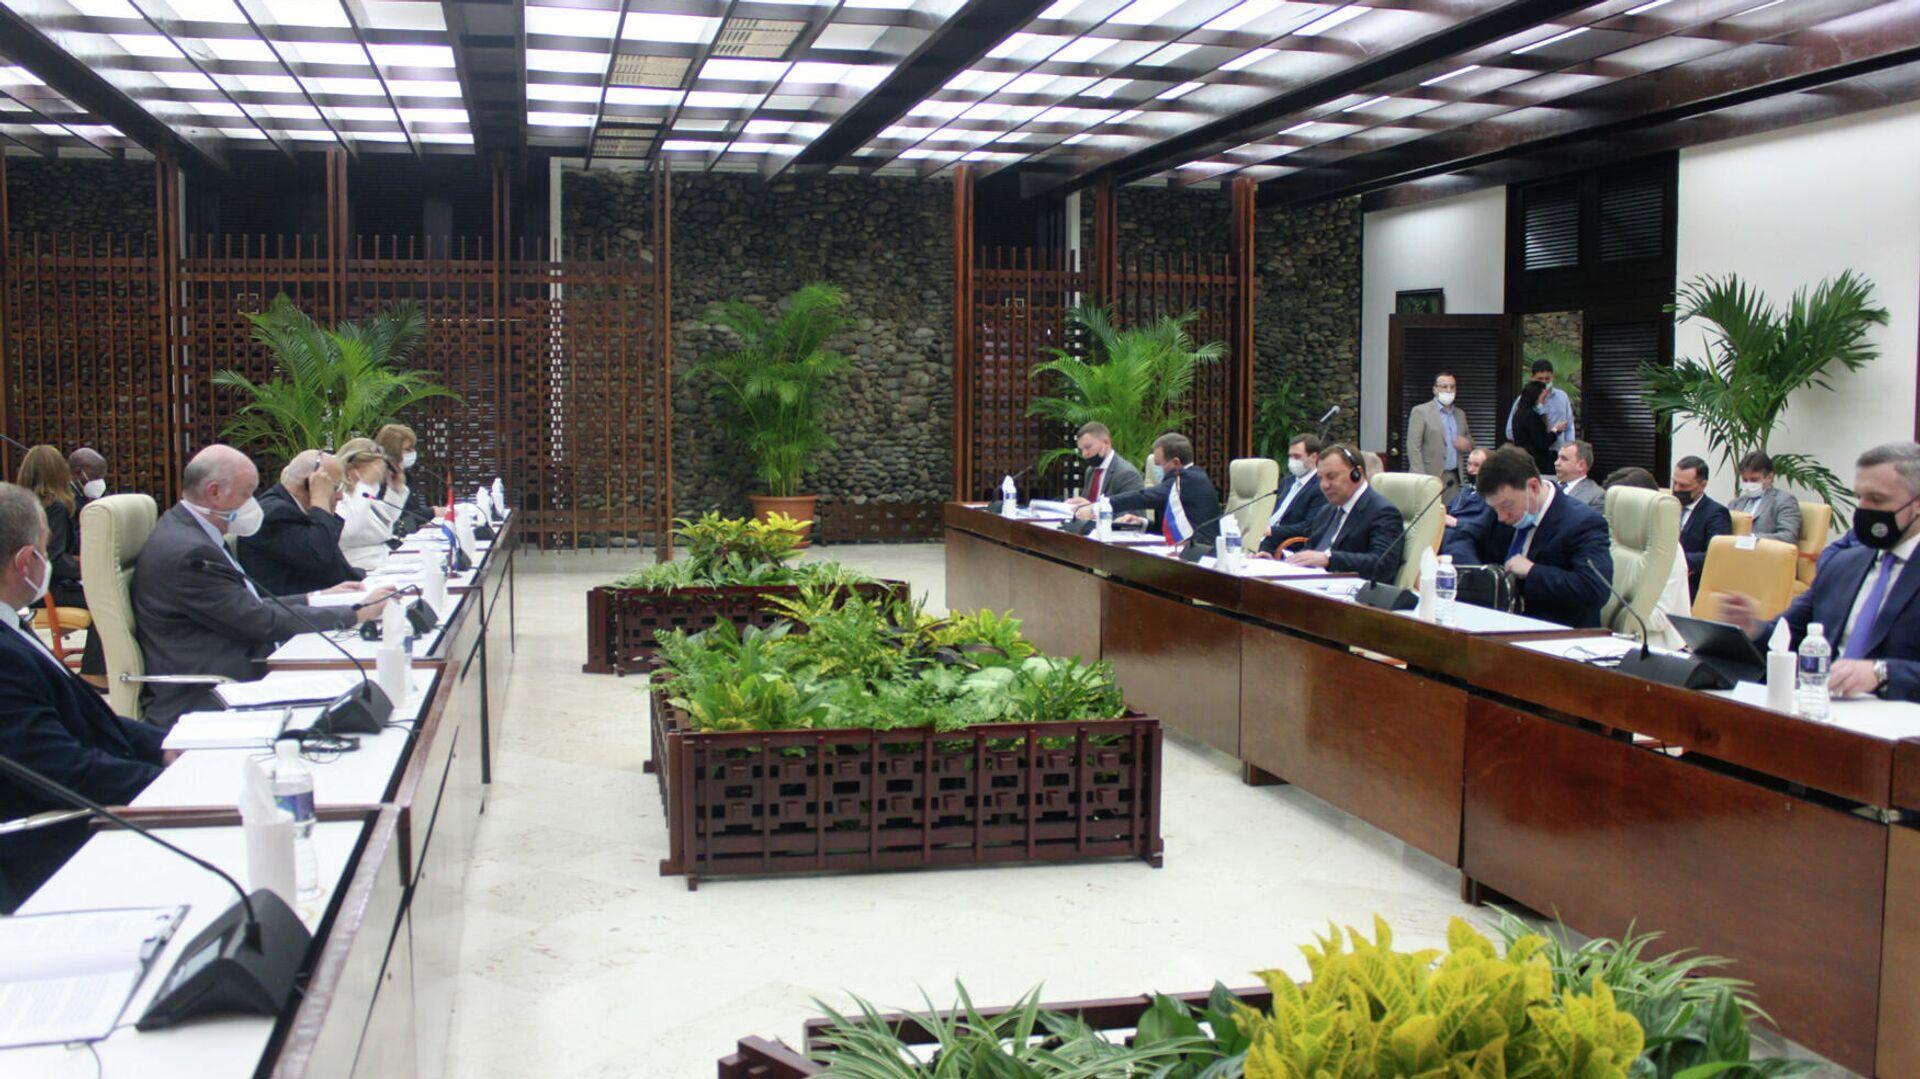 XVIII sesión de la Comisión Intergubernamental Rusia-Cuba - Sputnik Mundo, 1920, 31.03.2021